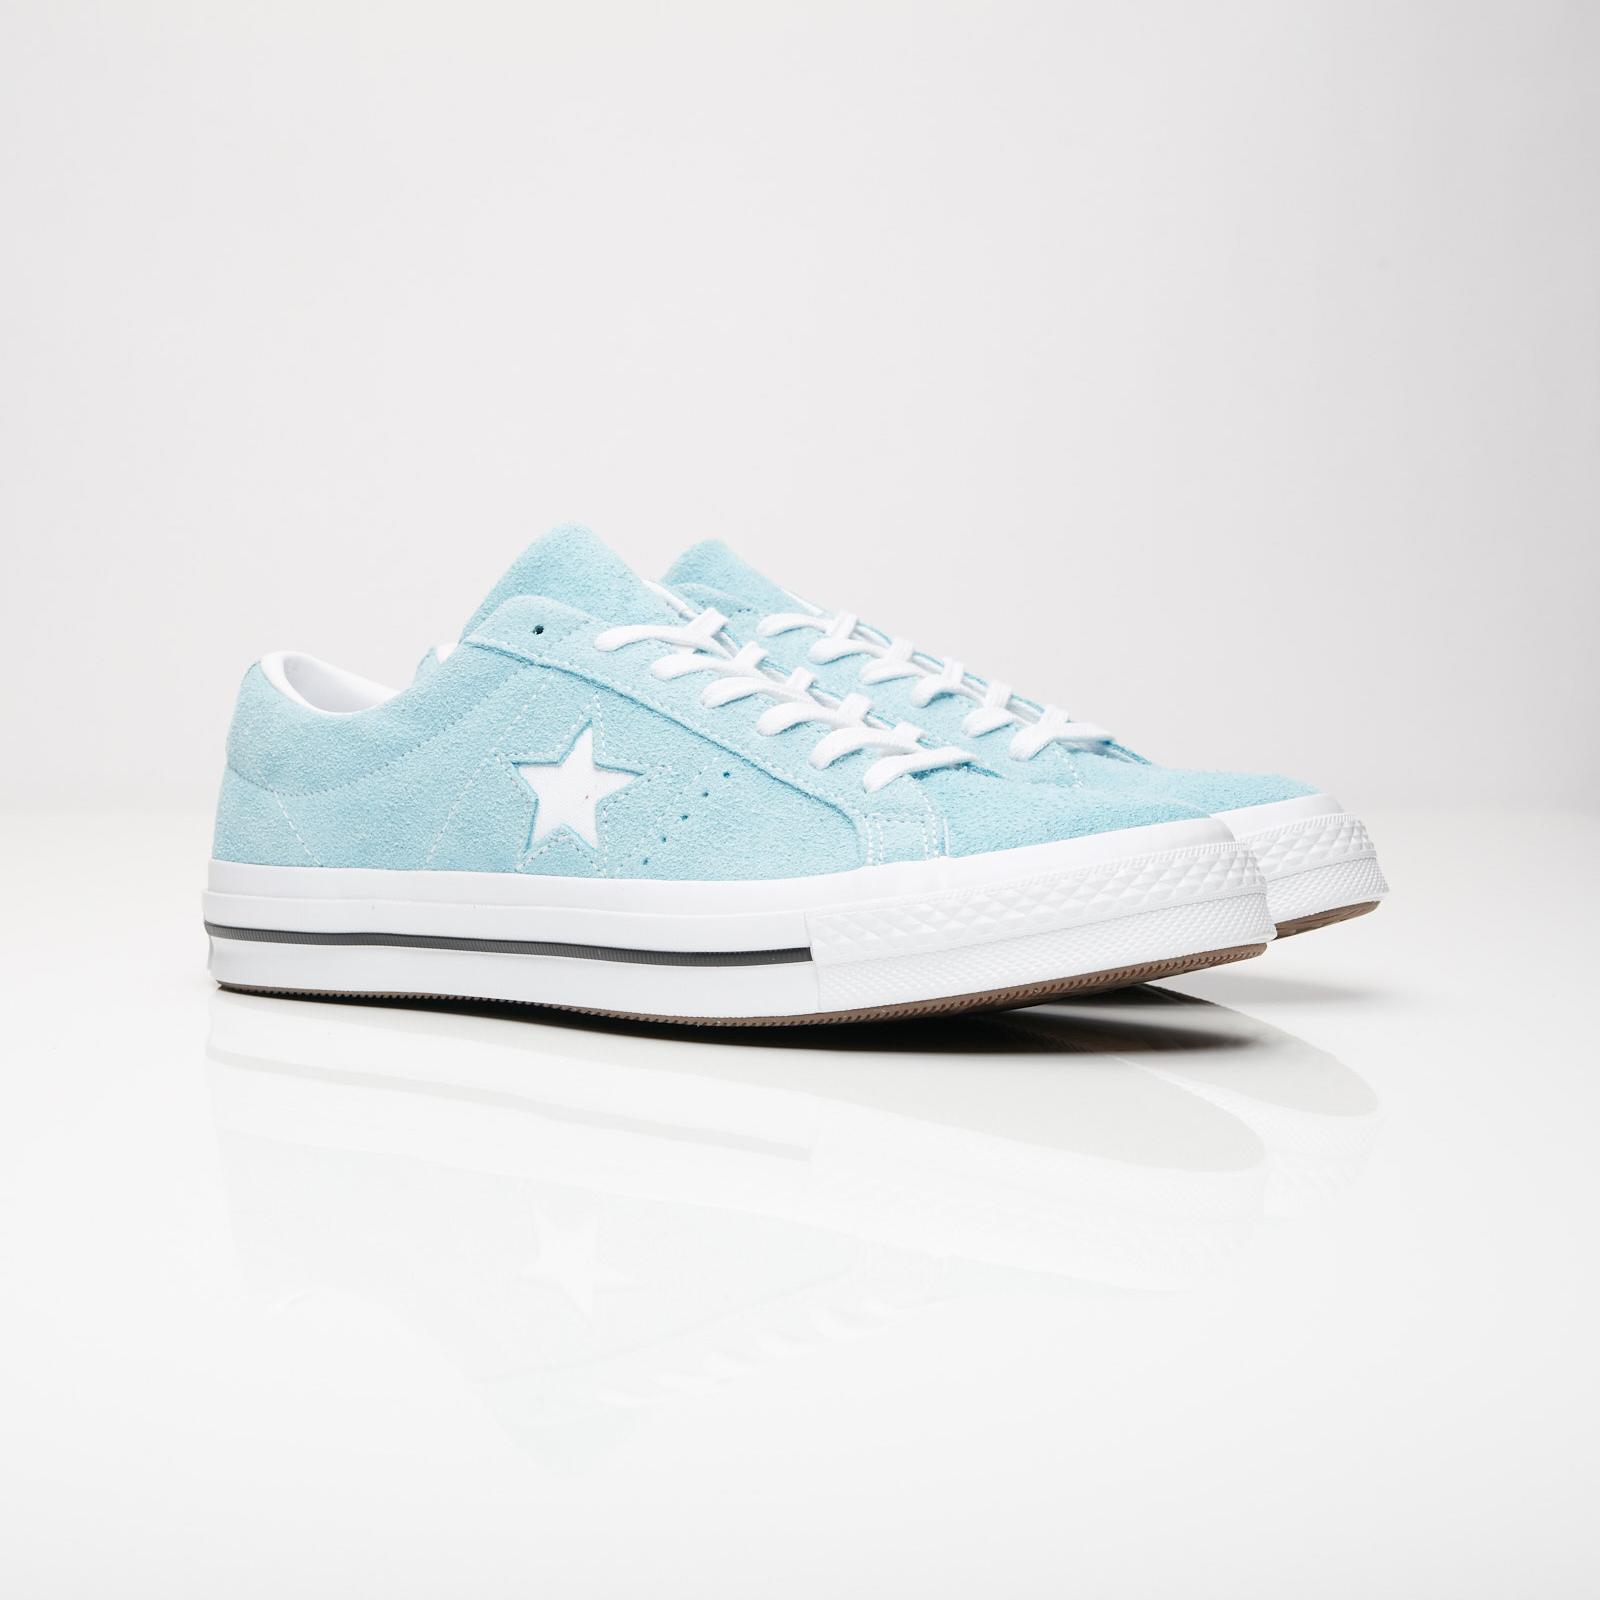 7923ef31b460 Converse One Star Ox - 161575c - Sneakersnstuff